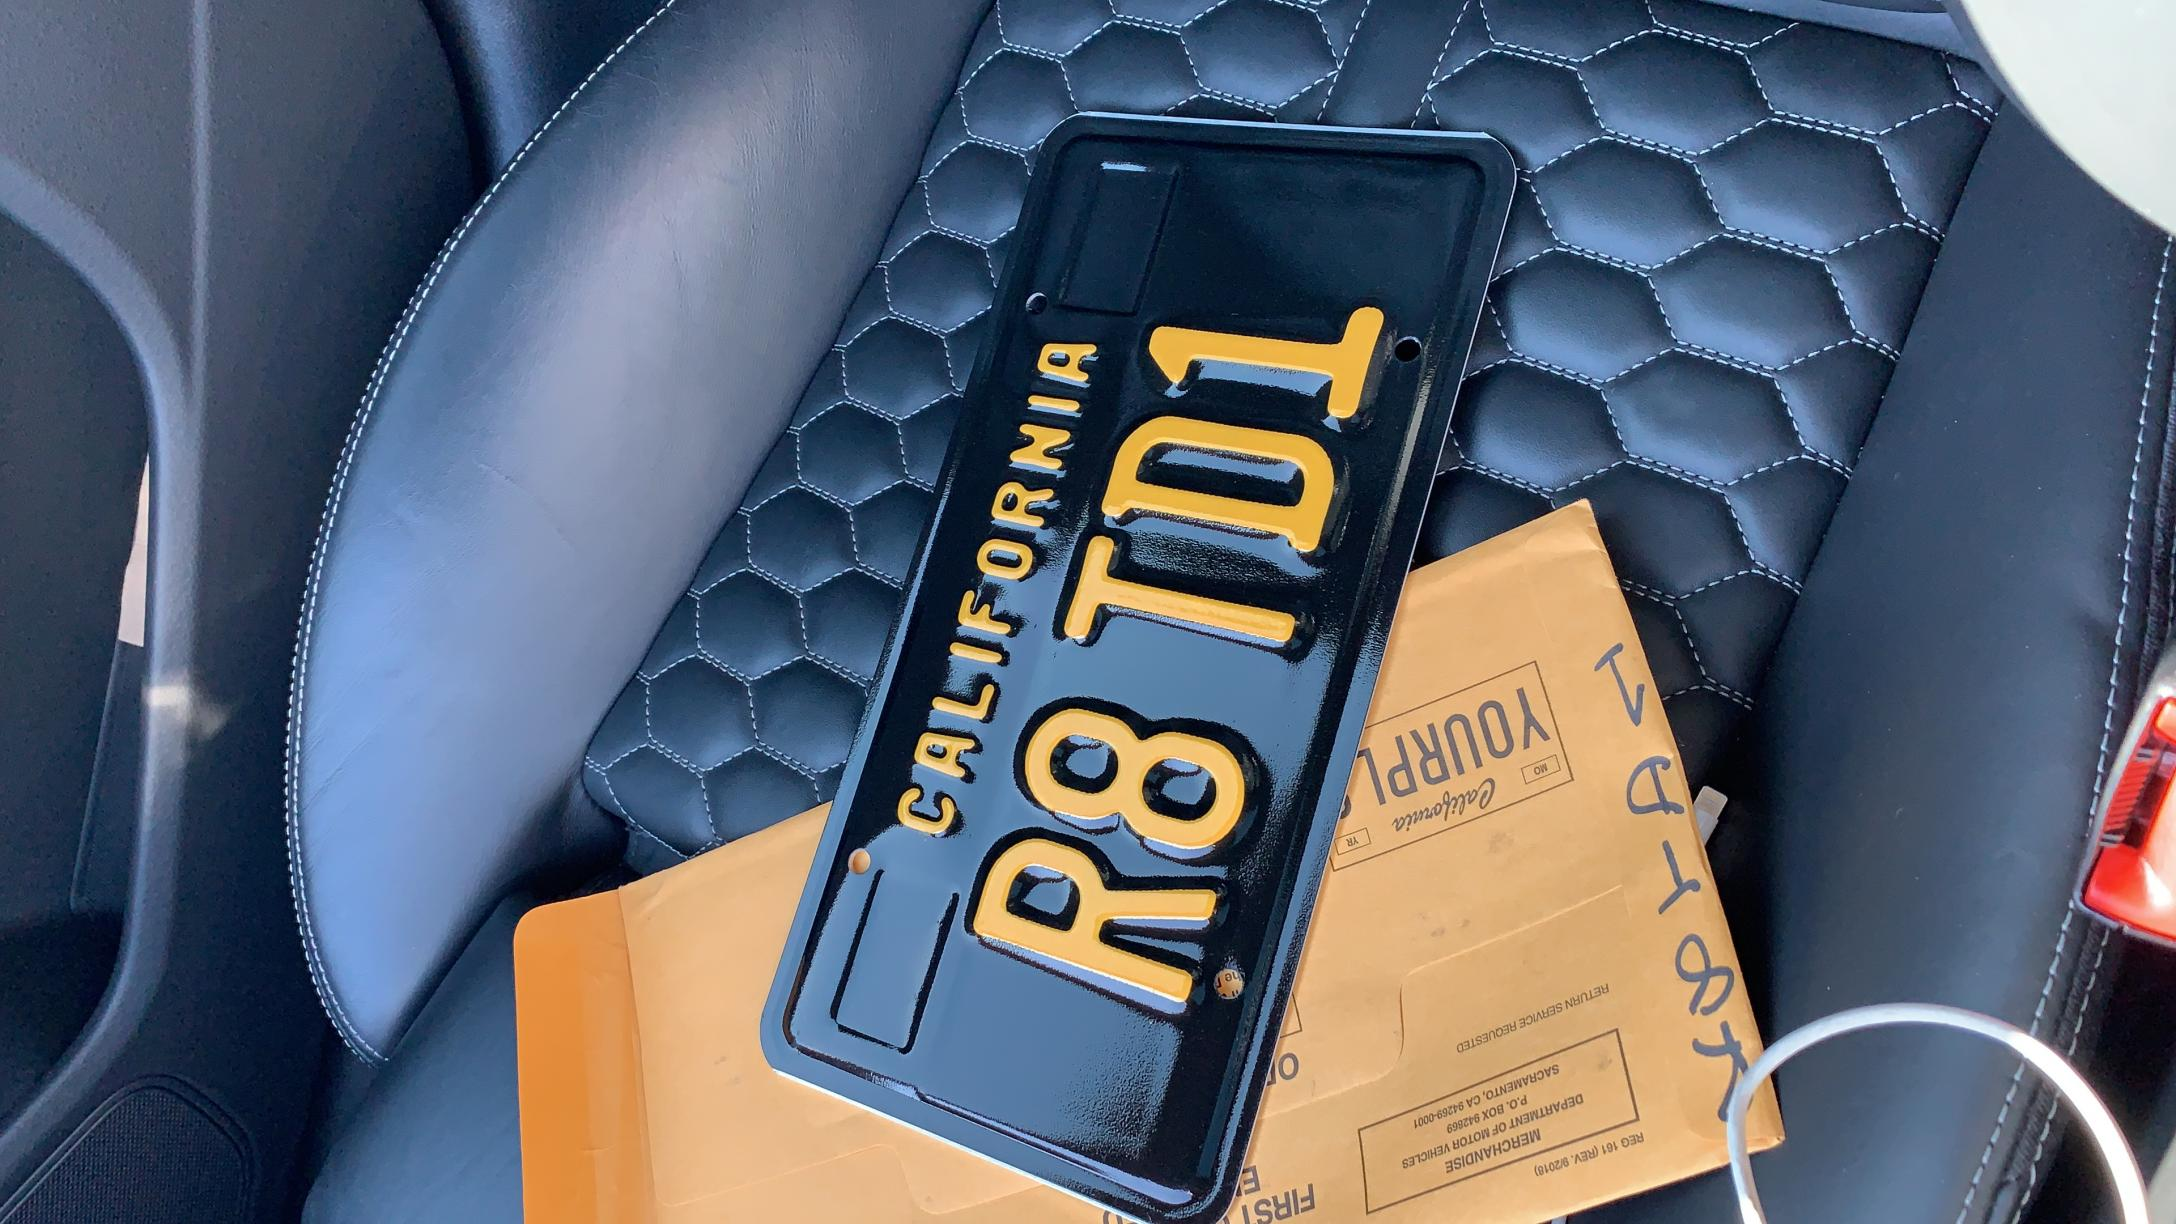 Best Custom License Plate-f15dc150-3d1a-4f18-bf80-b964e29955d5.jpg